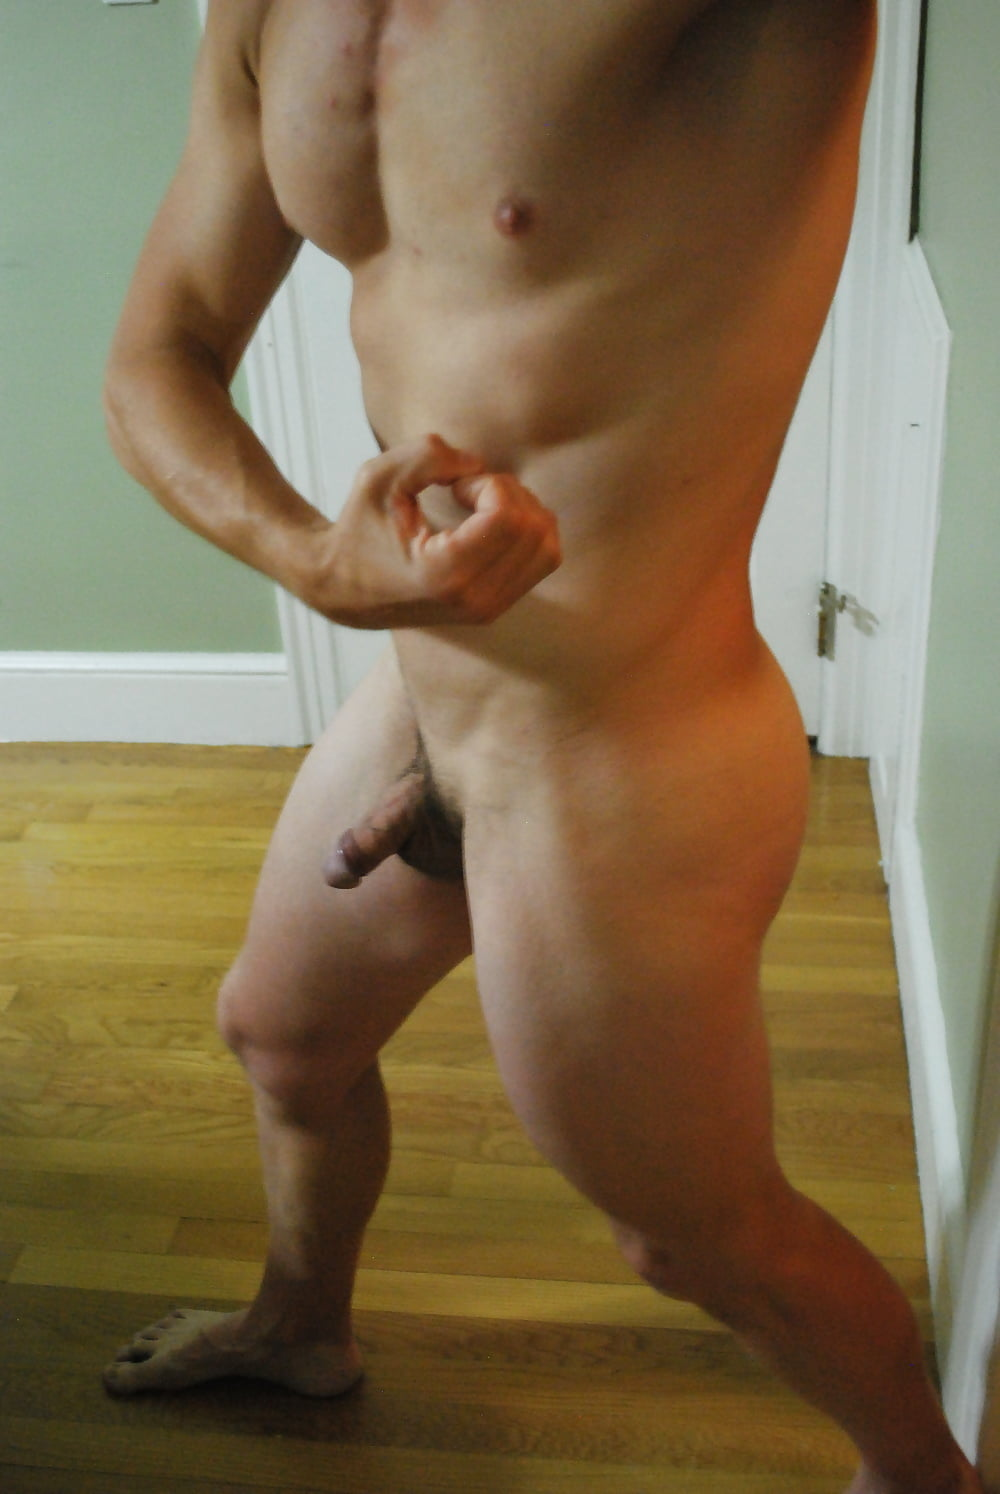 Attractive Nude Male Selfie Pic